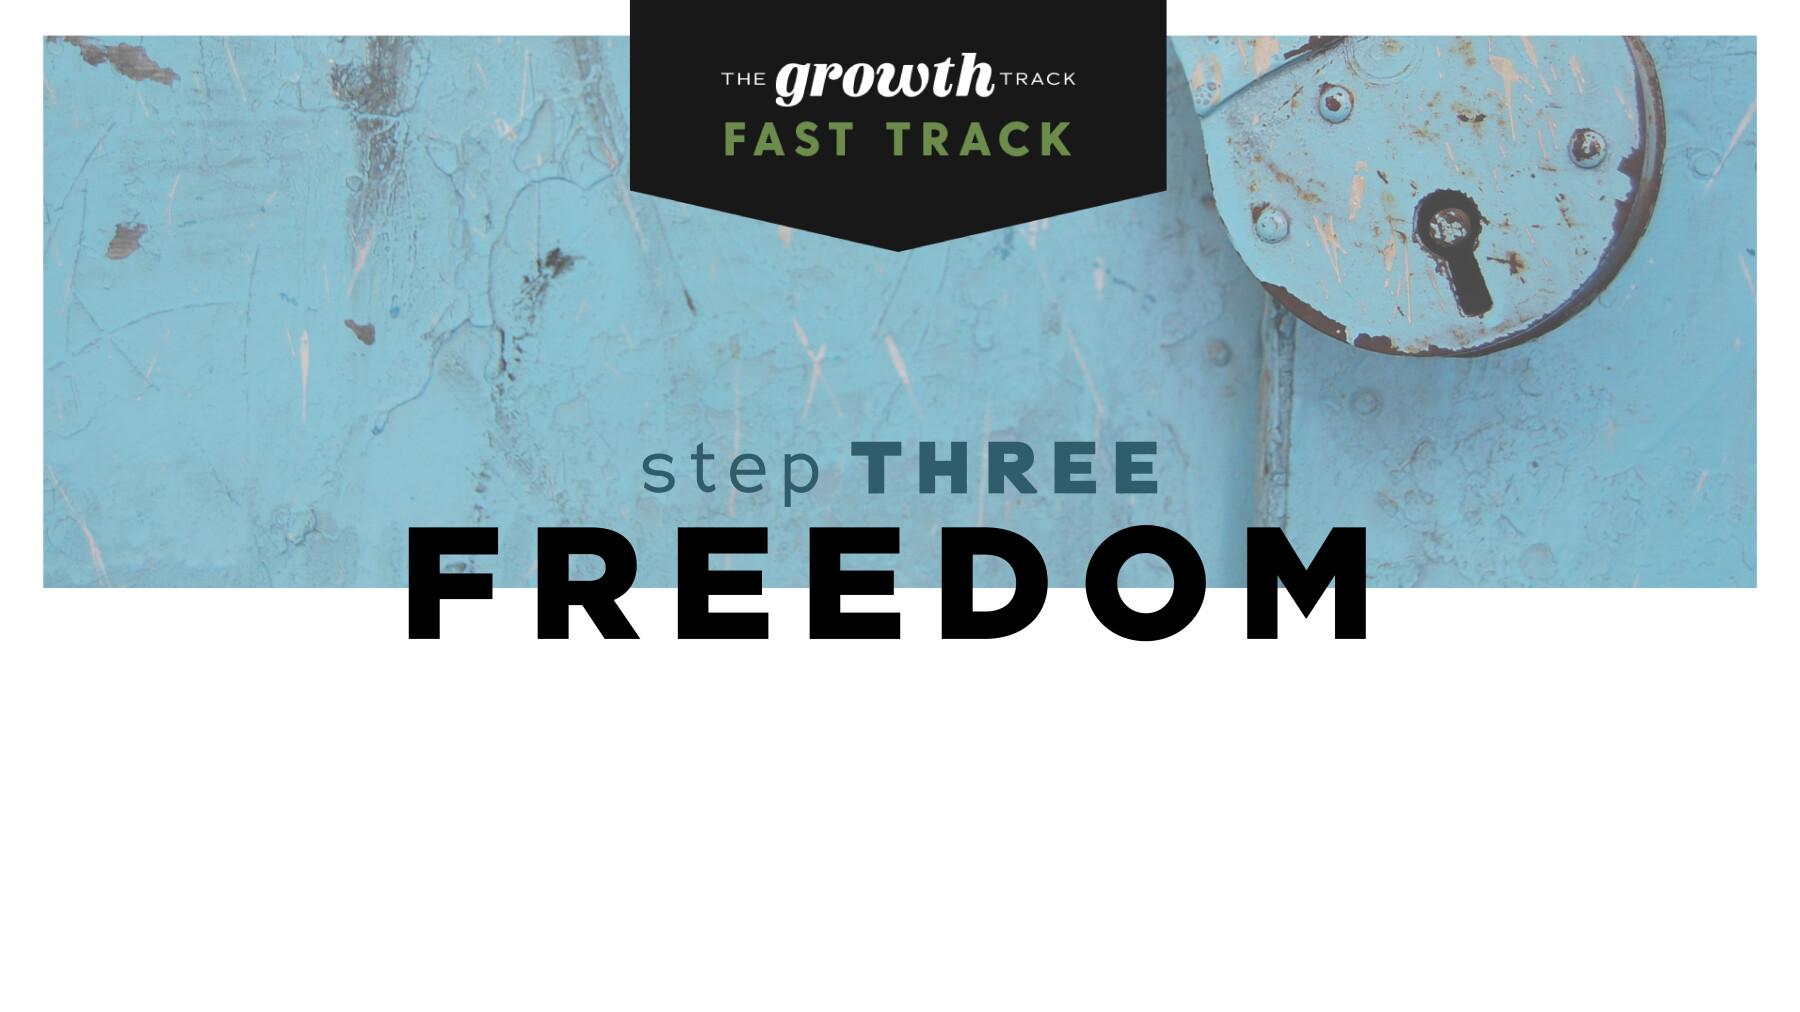 Growth Track | Fast Track: Freedom